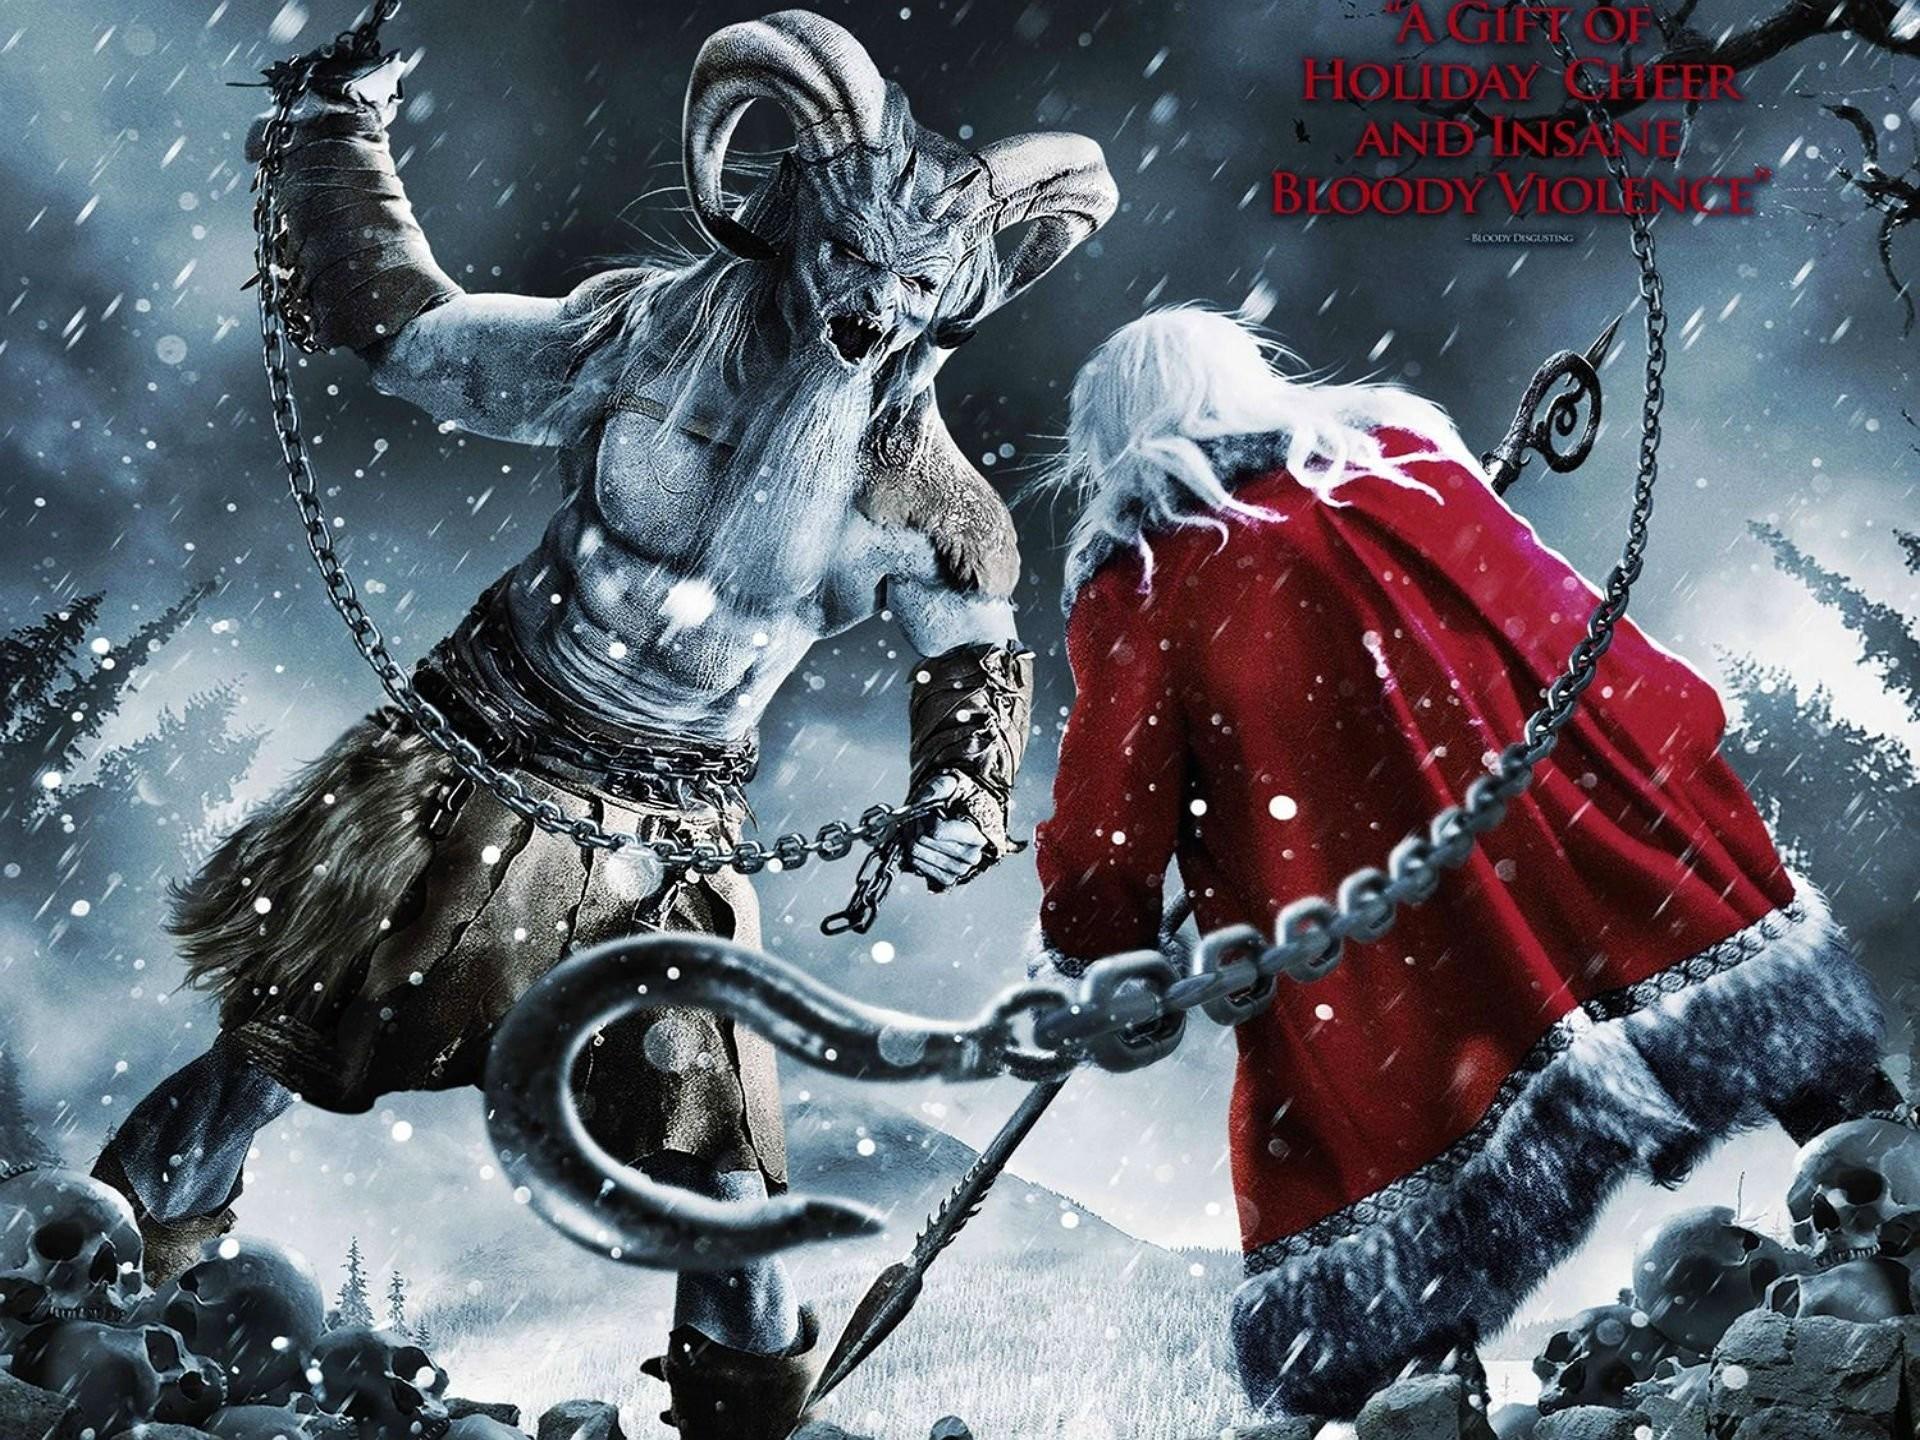 Res: 1920x1440, view, artwork, christmas, demon,free images, story,krampus, horror,  monster, evil, high resolution occult, dark, mobile, poster Wallpaper HD